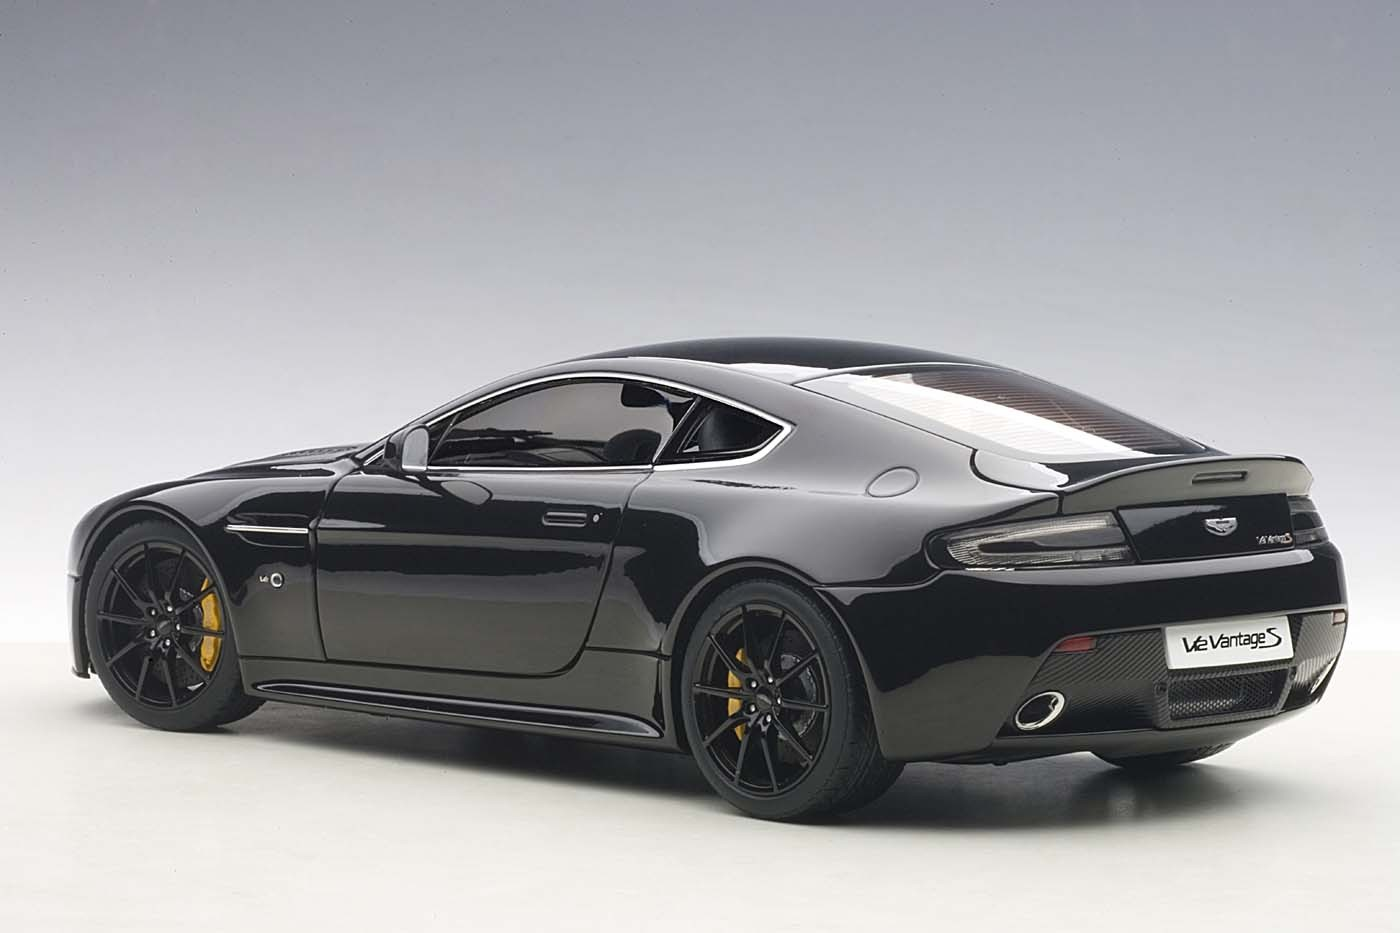 Highly Detailed Autoart Diecast Model Car Black Aston